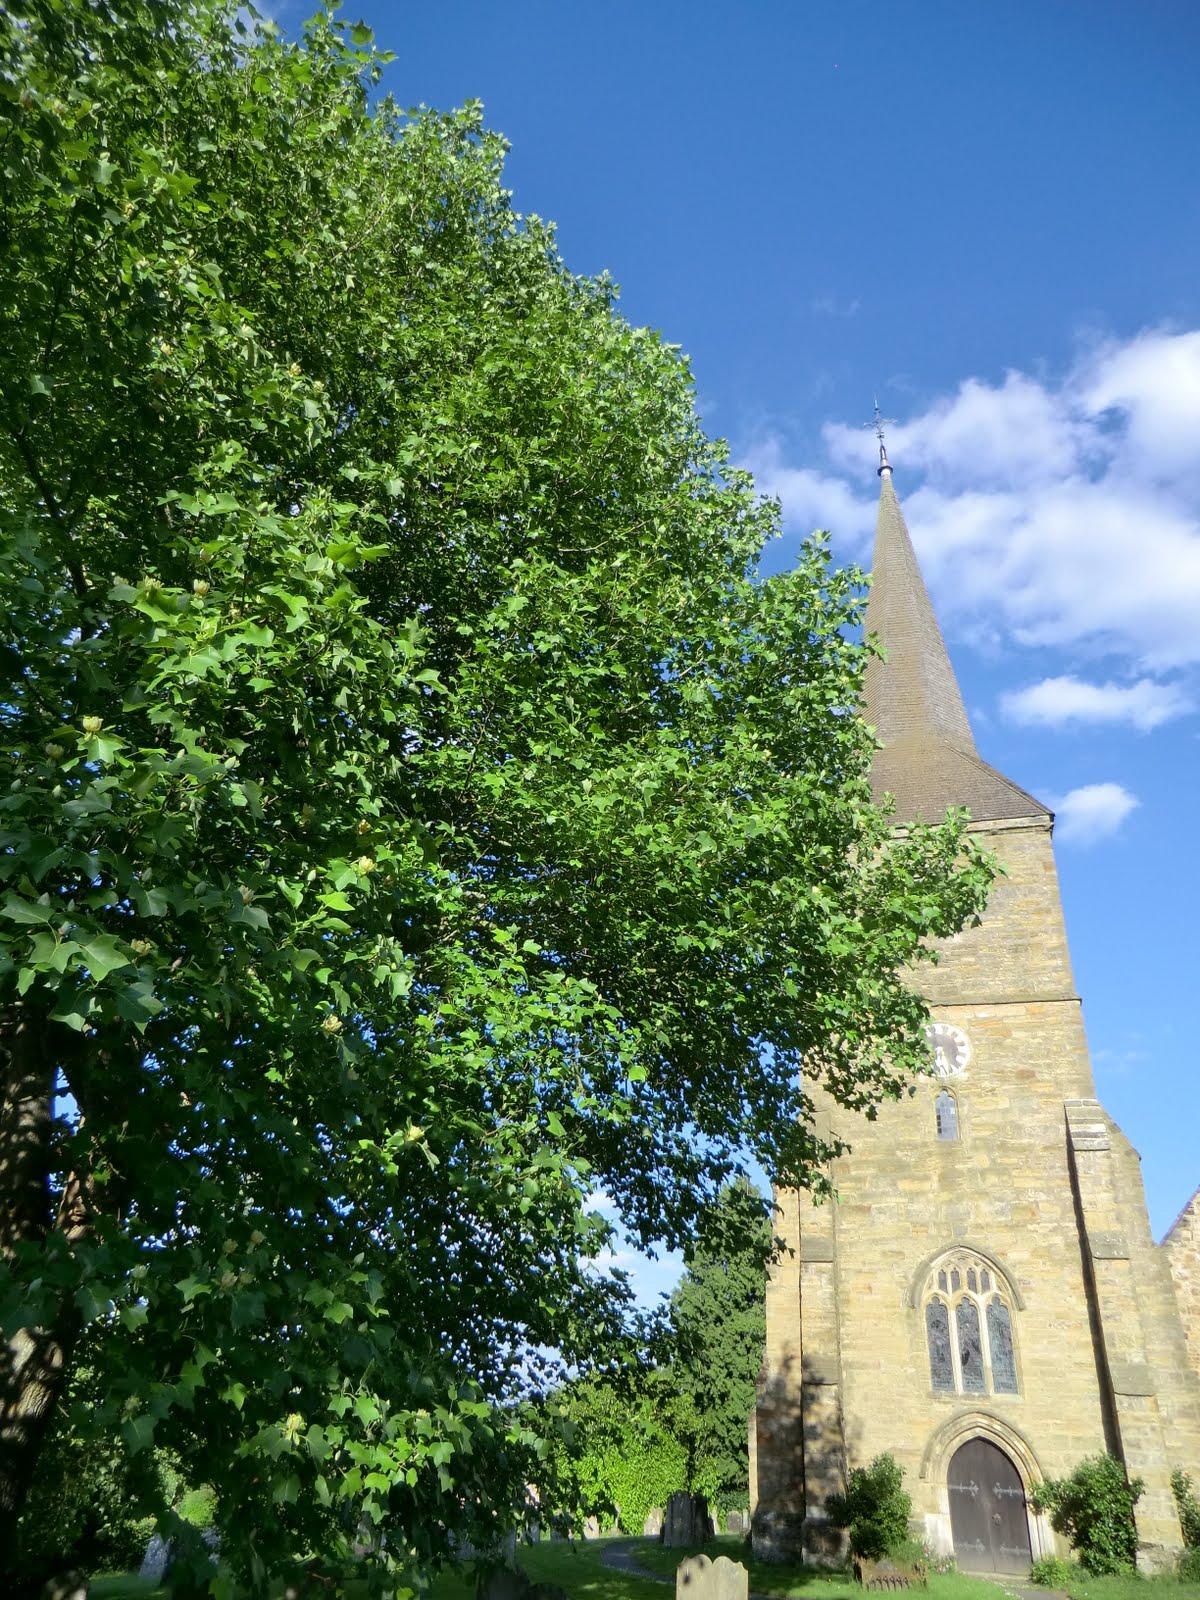 CIMG7332 Tulip tree and St Mary the Virgin, Hartfield